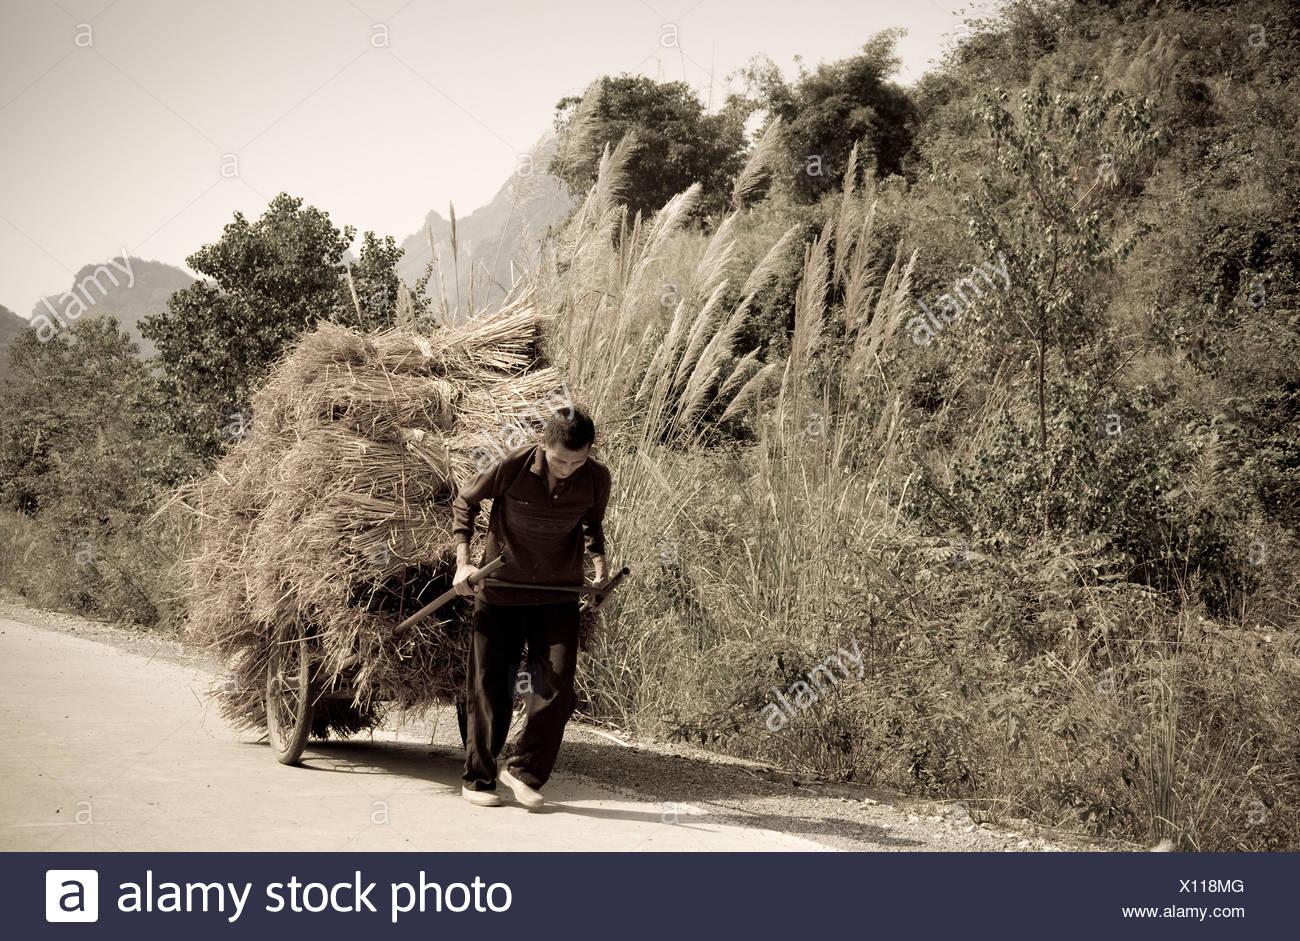 Man Carting Hay Down A Road - Stock Image